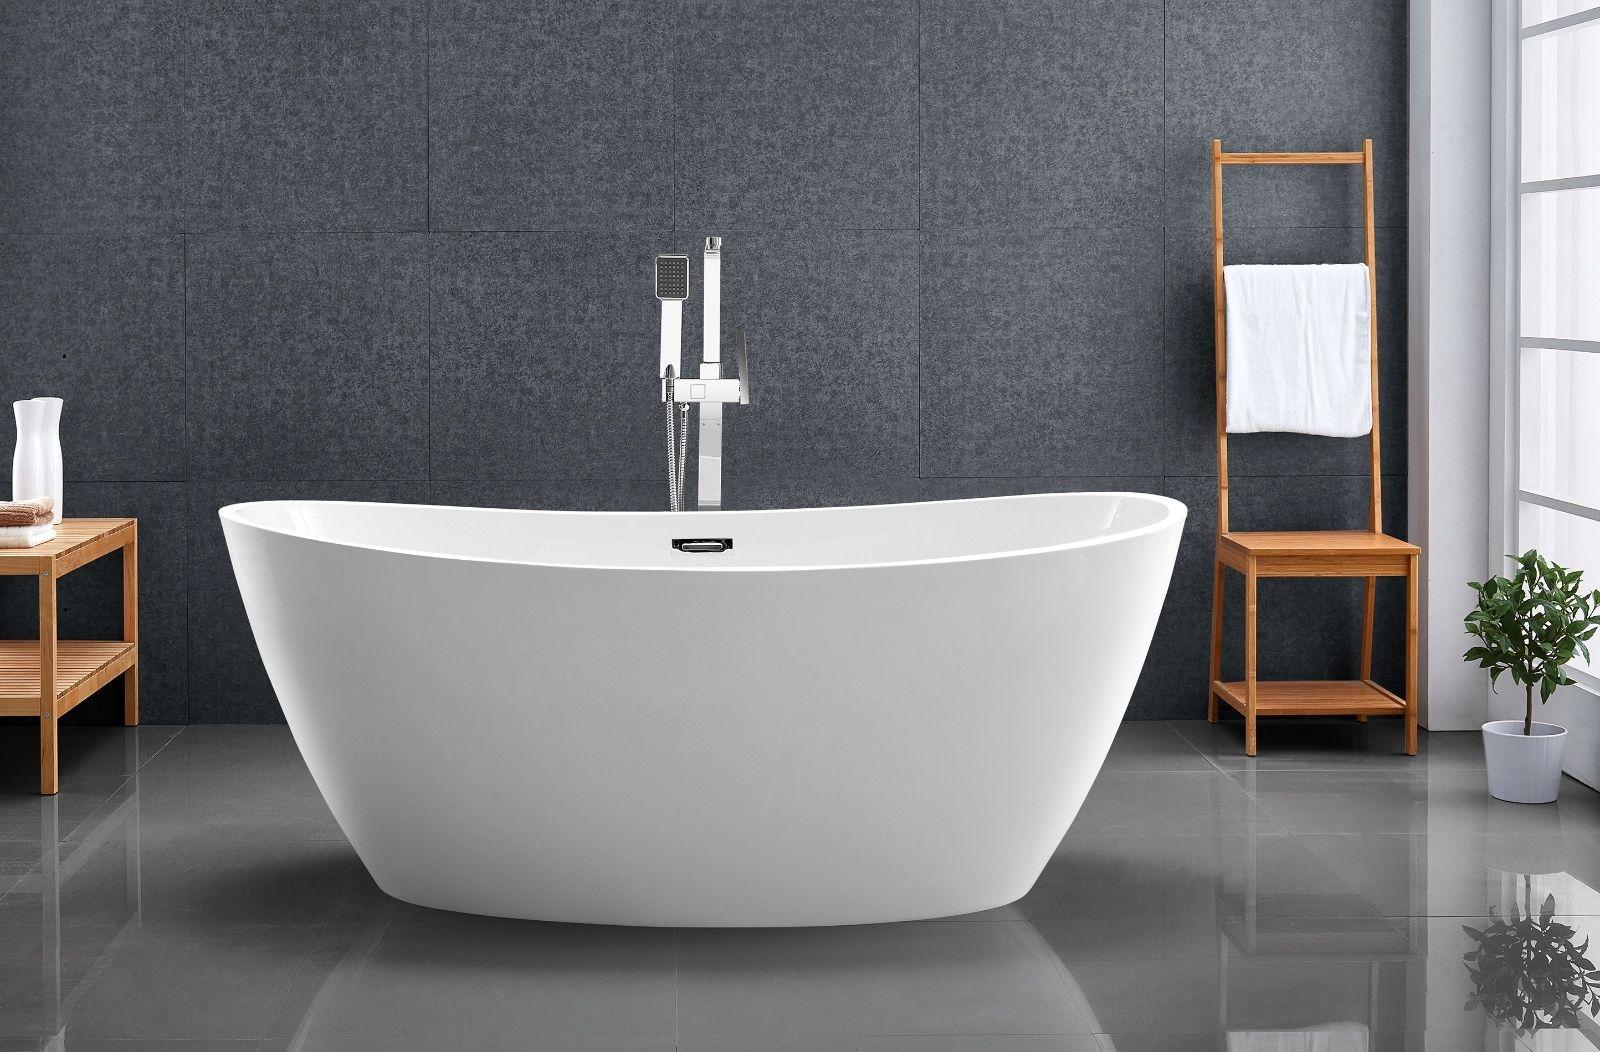 Top Acrylic Freestanding Tub Gallery Of Bathtub Style